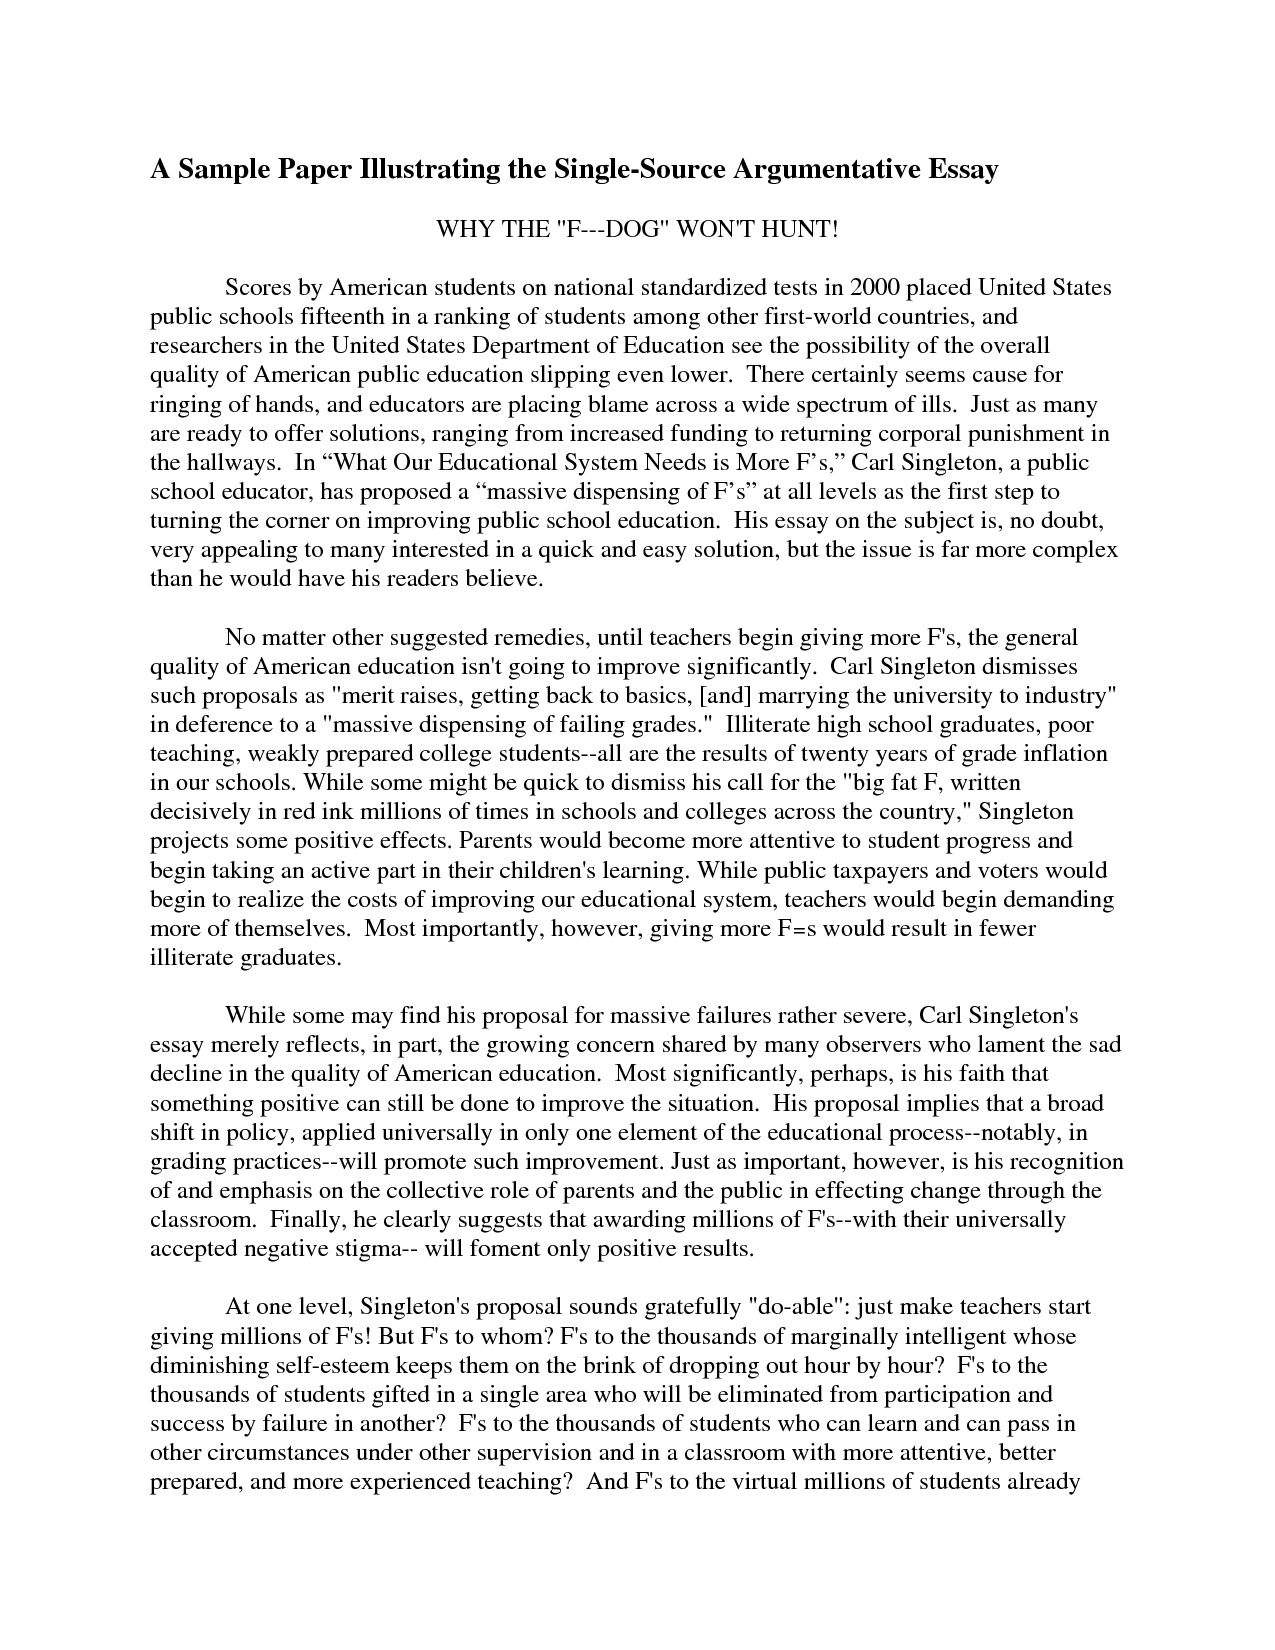 005 Argumentative Essay Sample Fyvb2pmxix Dreaded Writing Outline Persuasive Samples Grade 7 Apa Full